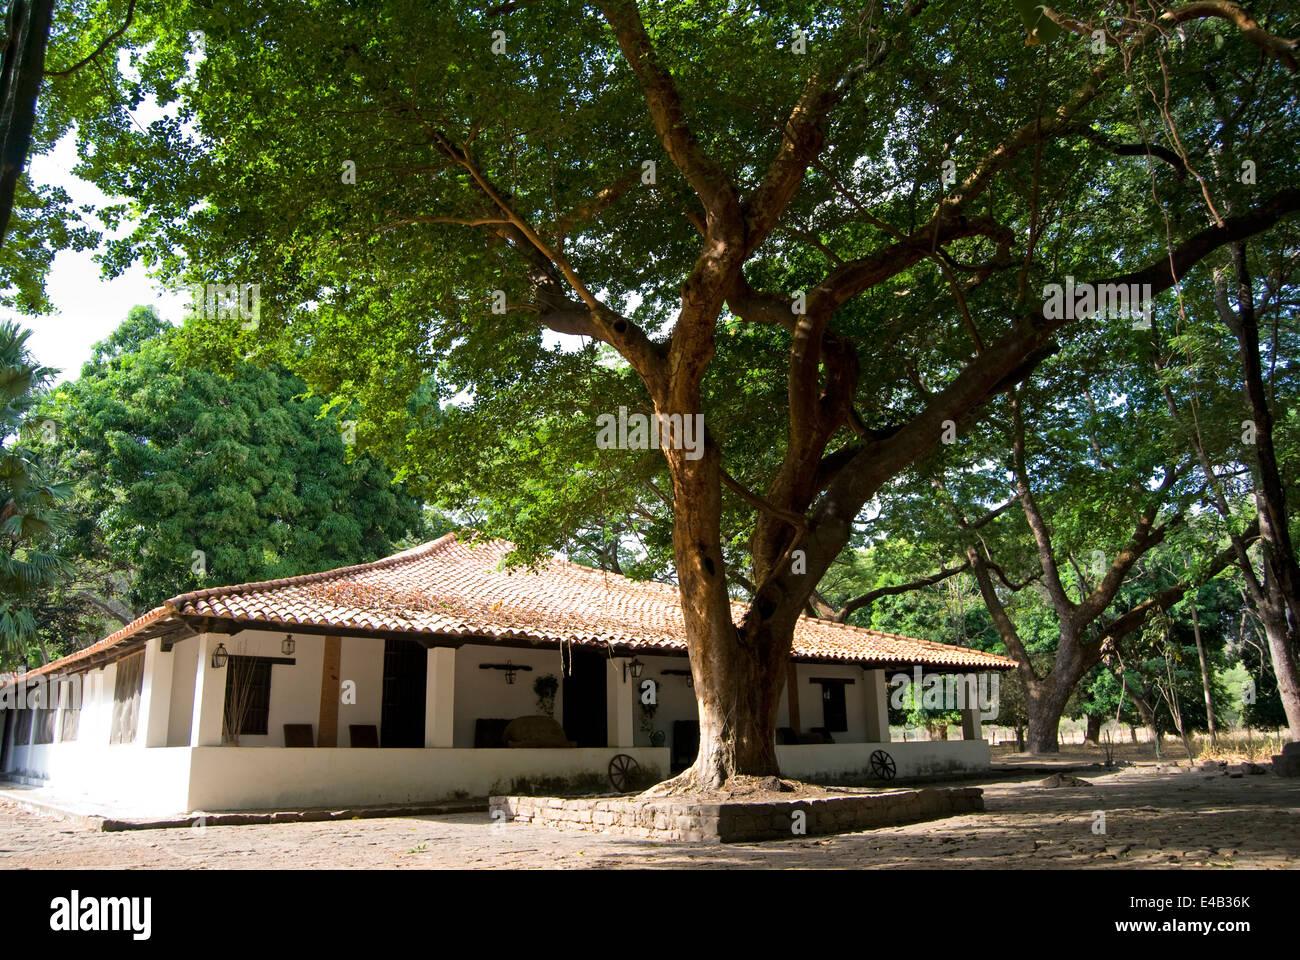 Venezuela Colonial House. - Stock Image